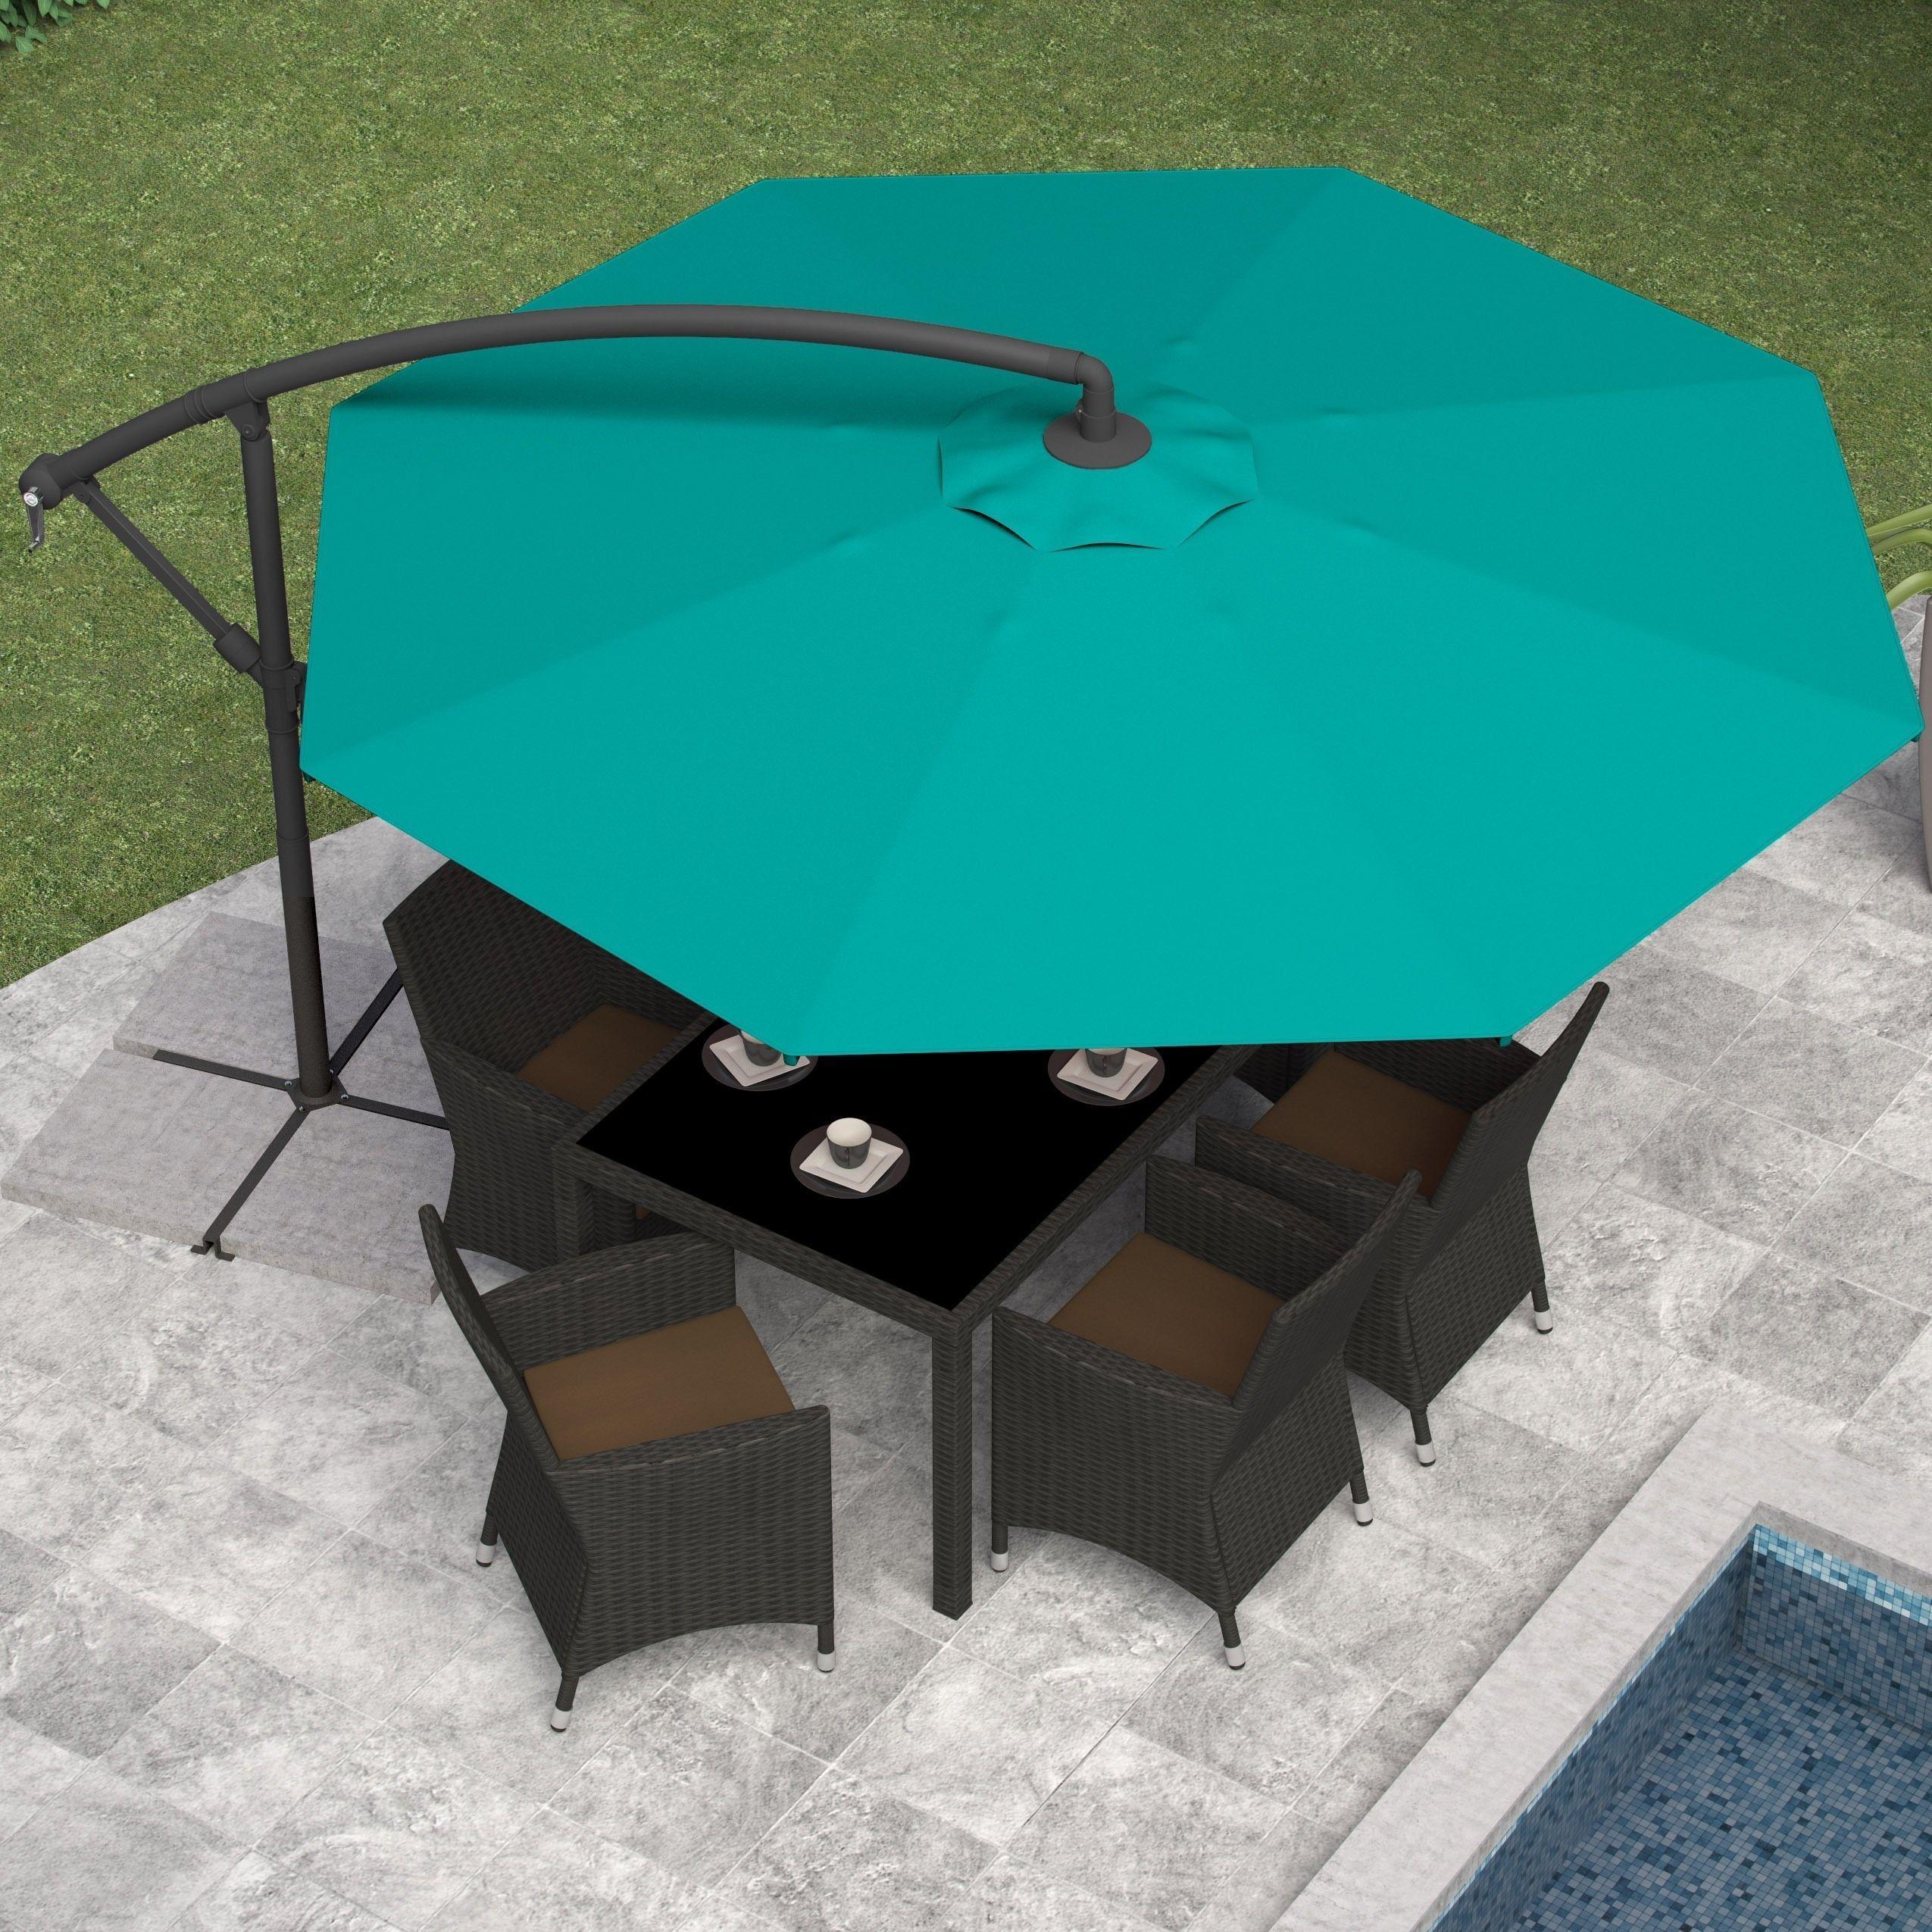 CorLiving Offset Patio Umbrella (Grey), Size 11 Foot (Polyester) #PPU 4x0 U